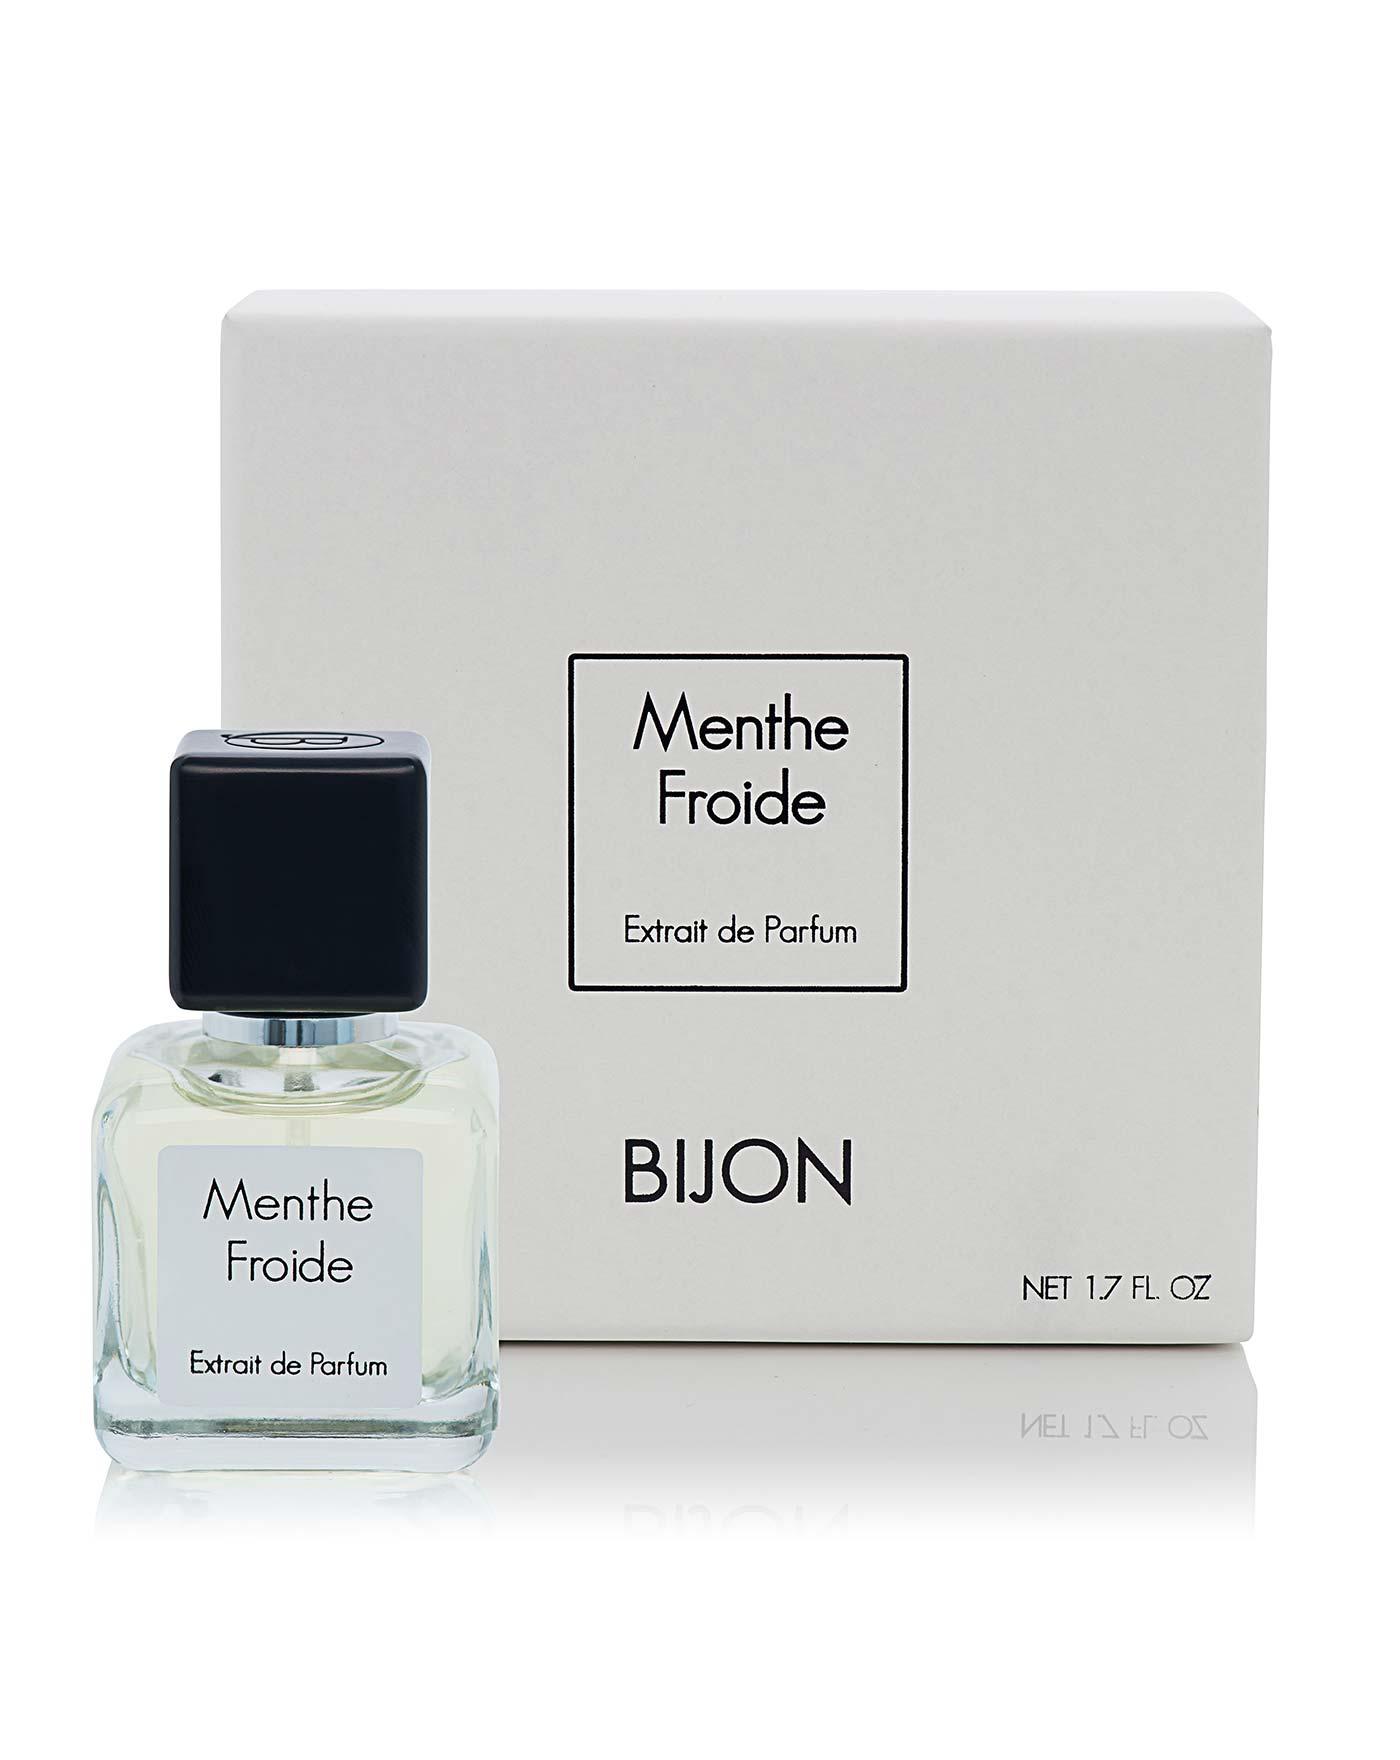 BIJON-Menthe-Froide-Extrait-de-Parfum-700x780.jpg